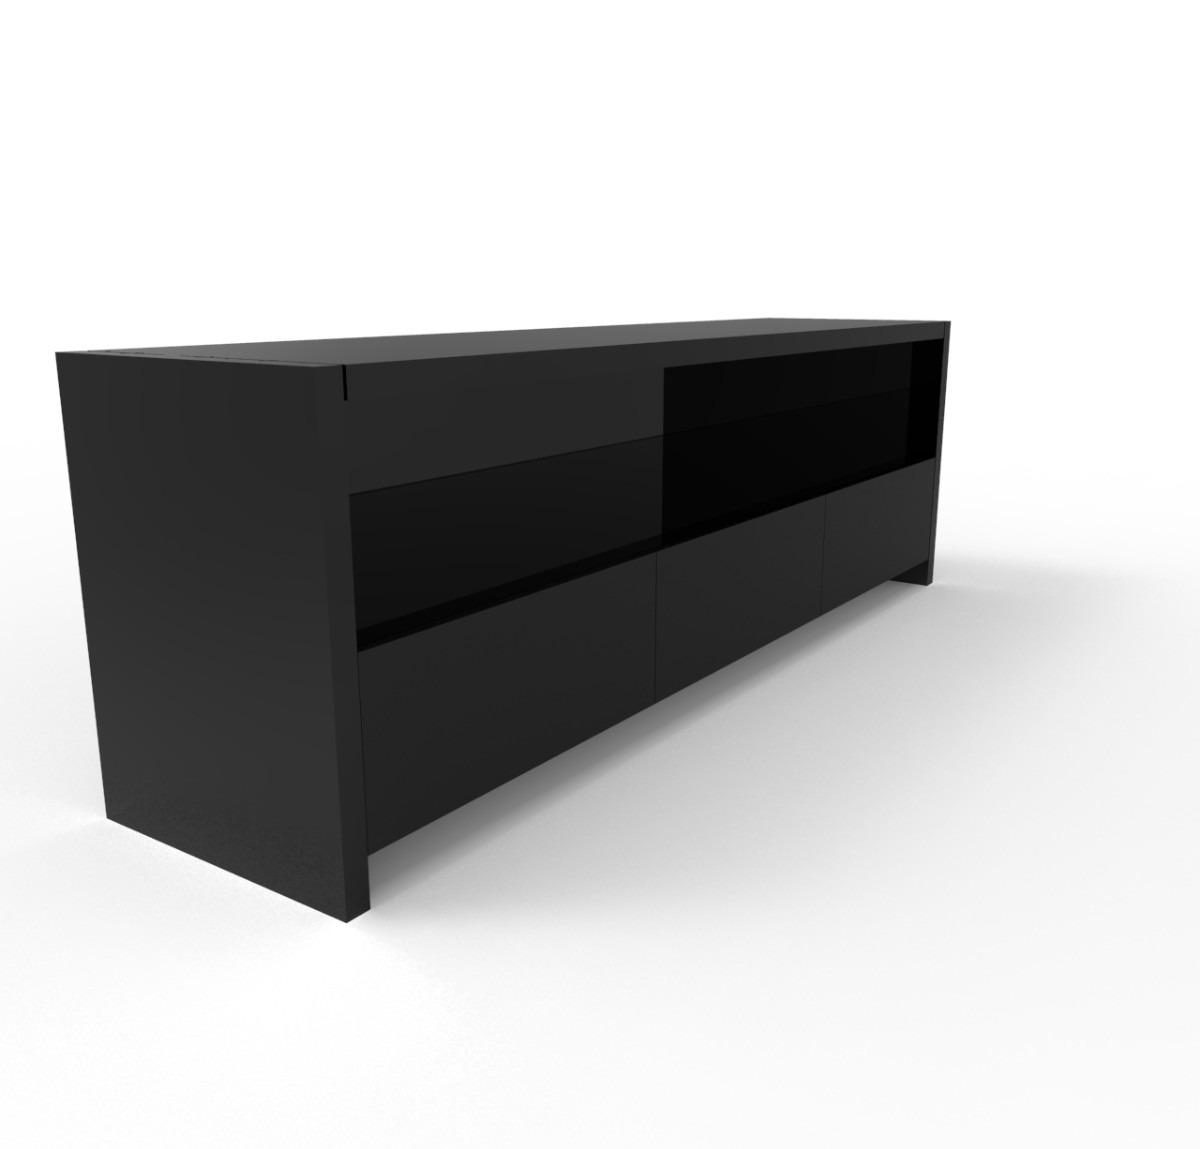 hacer mueble tv madera Hacer Mueble Tv Madera Post With Hacer Mueble Tv Madera